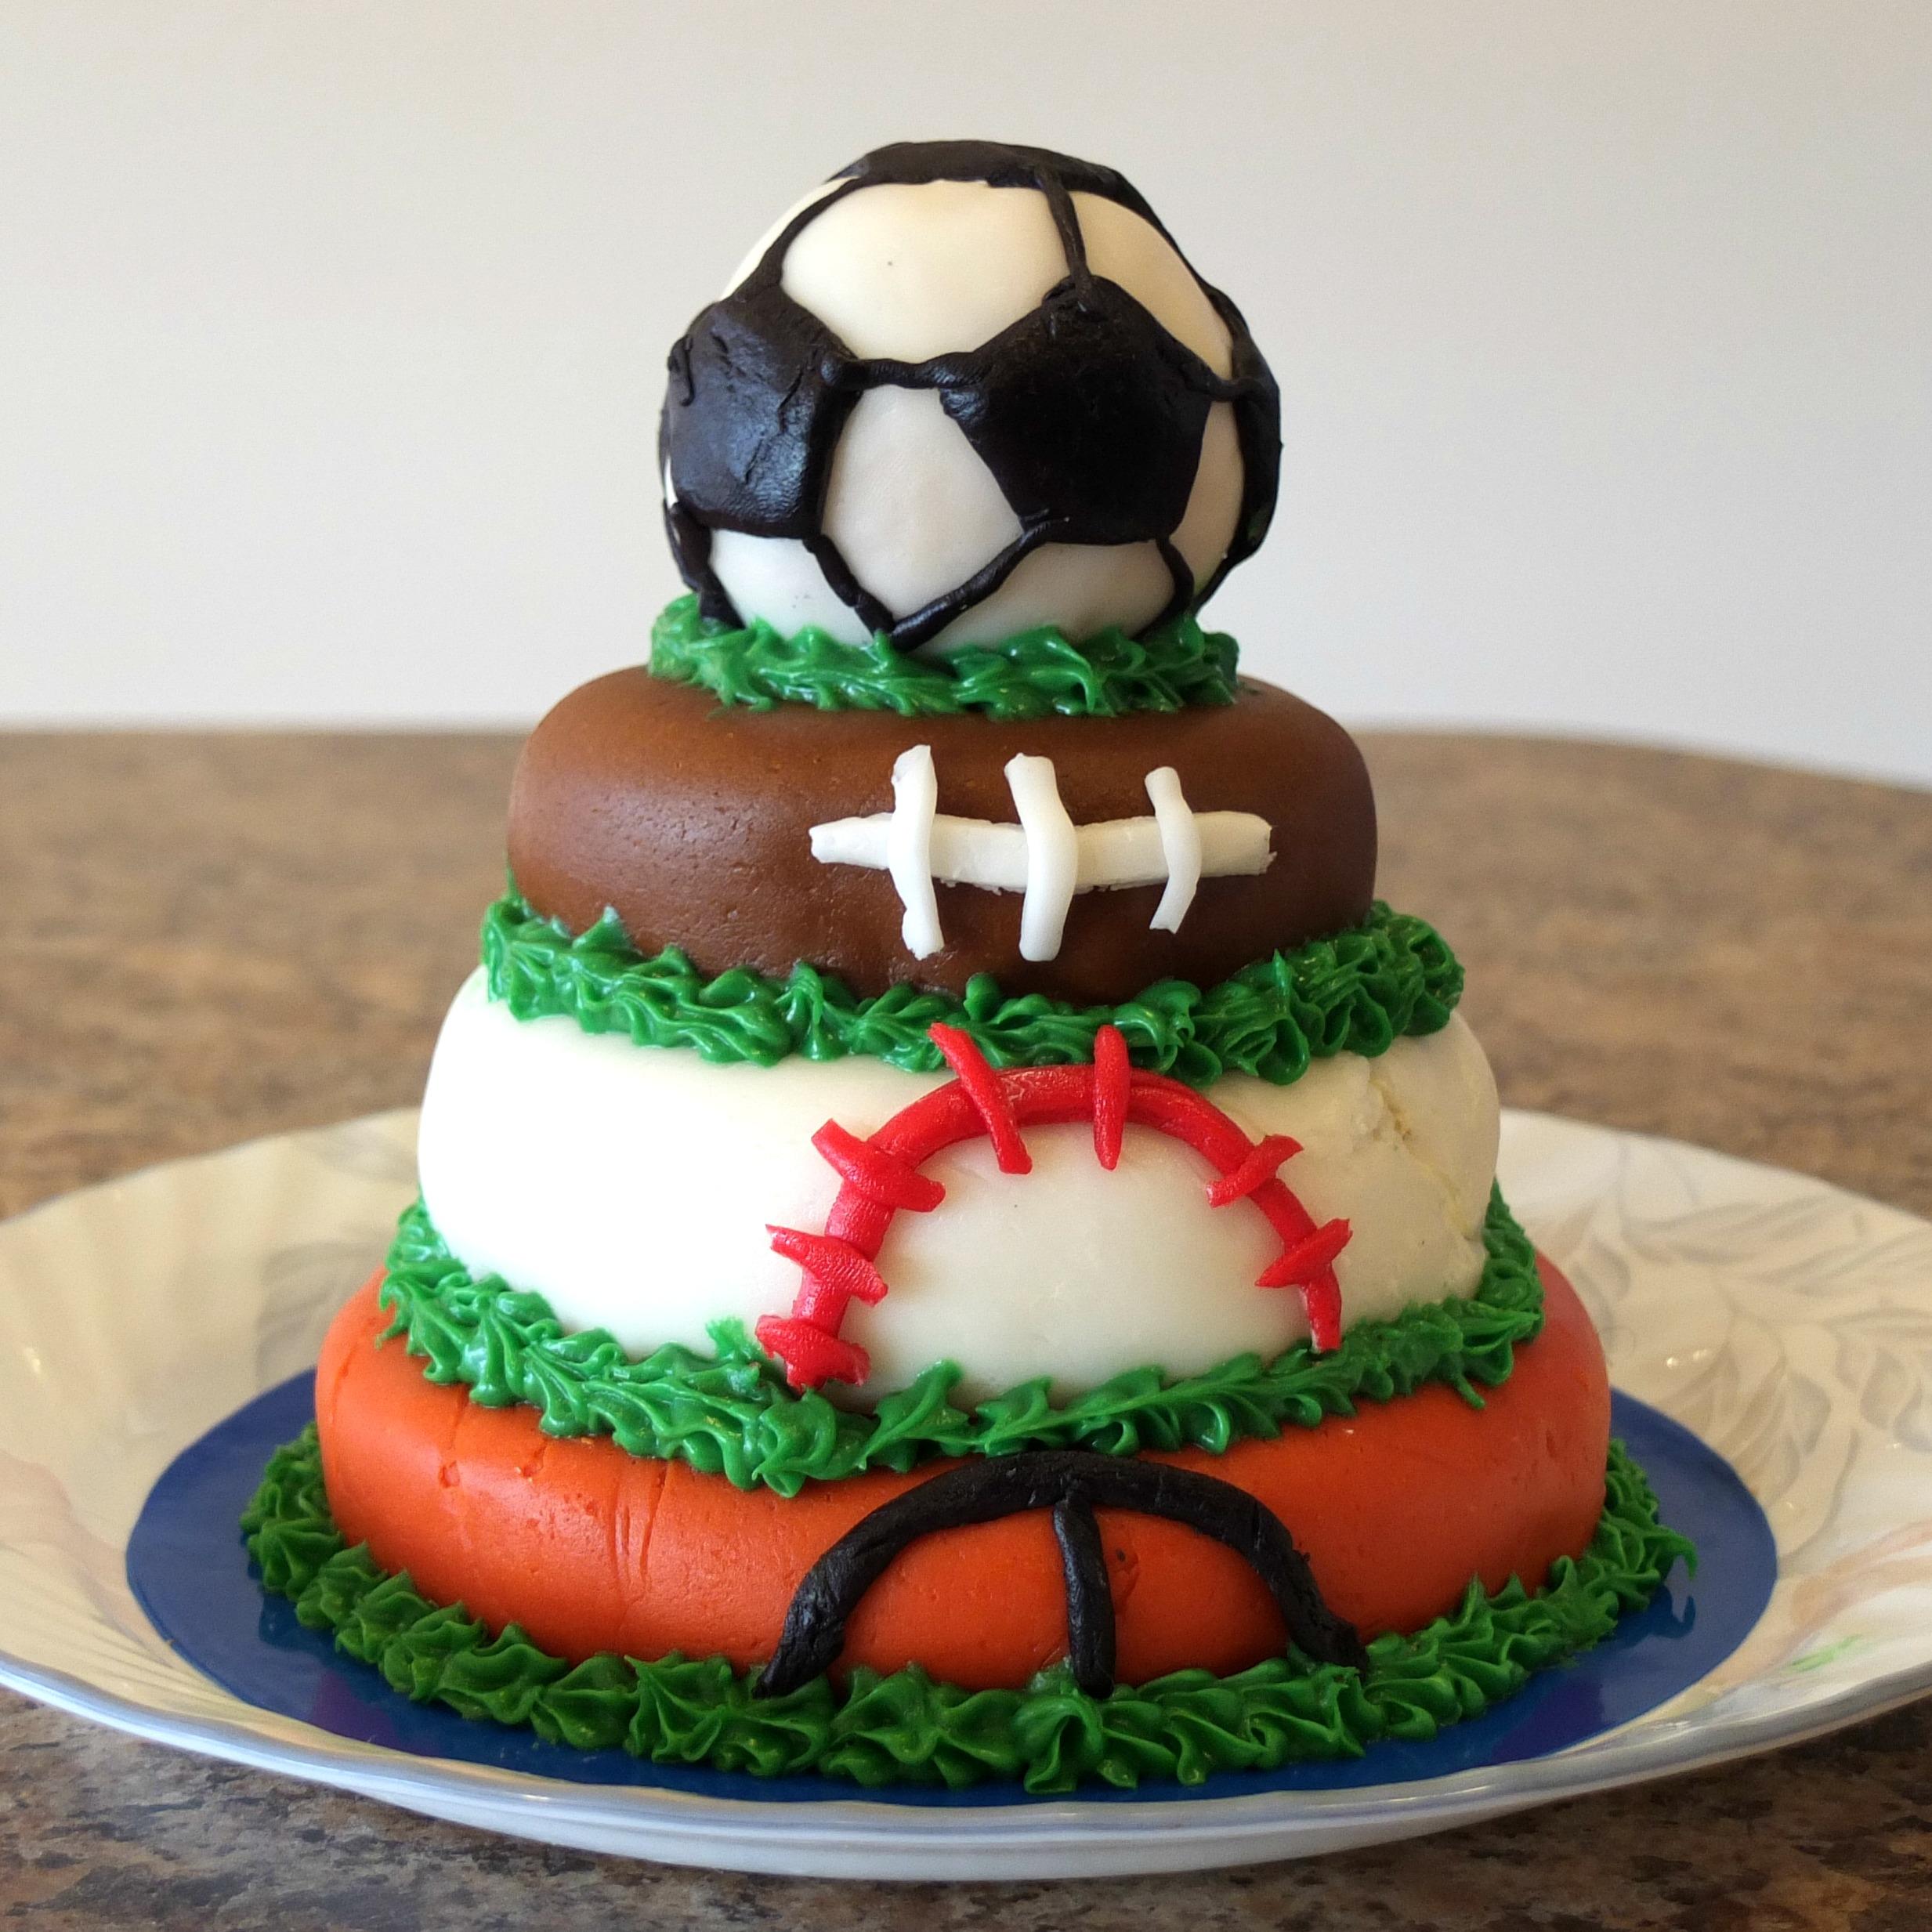 Ball Themed Birthday Cakes Ball-themed Birthday Party